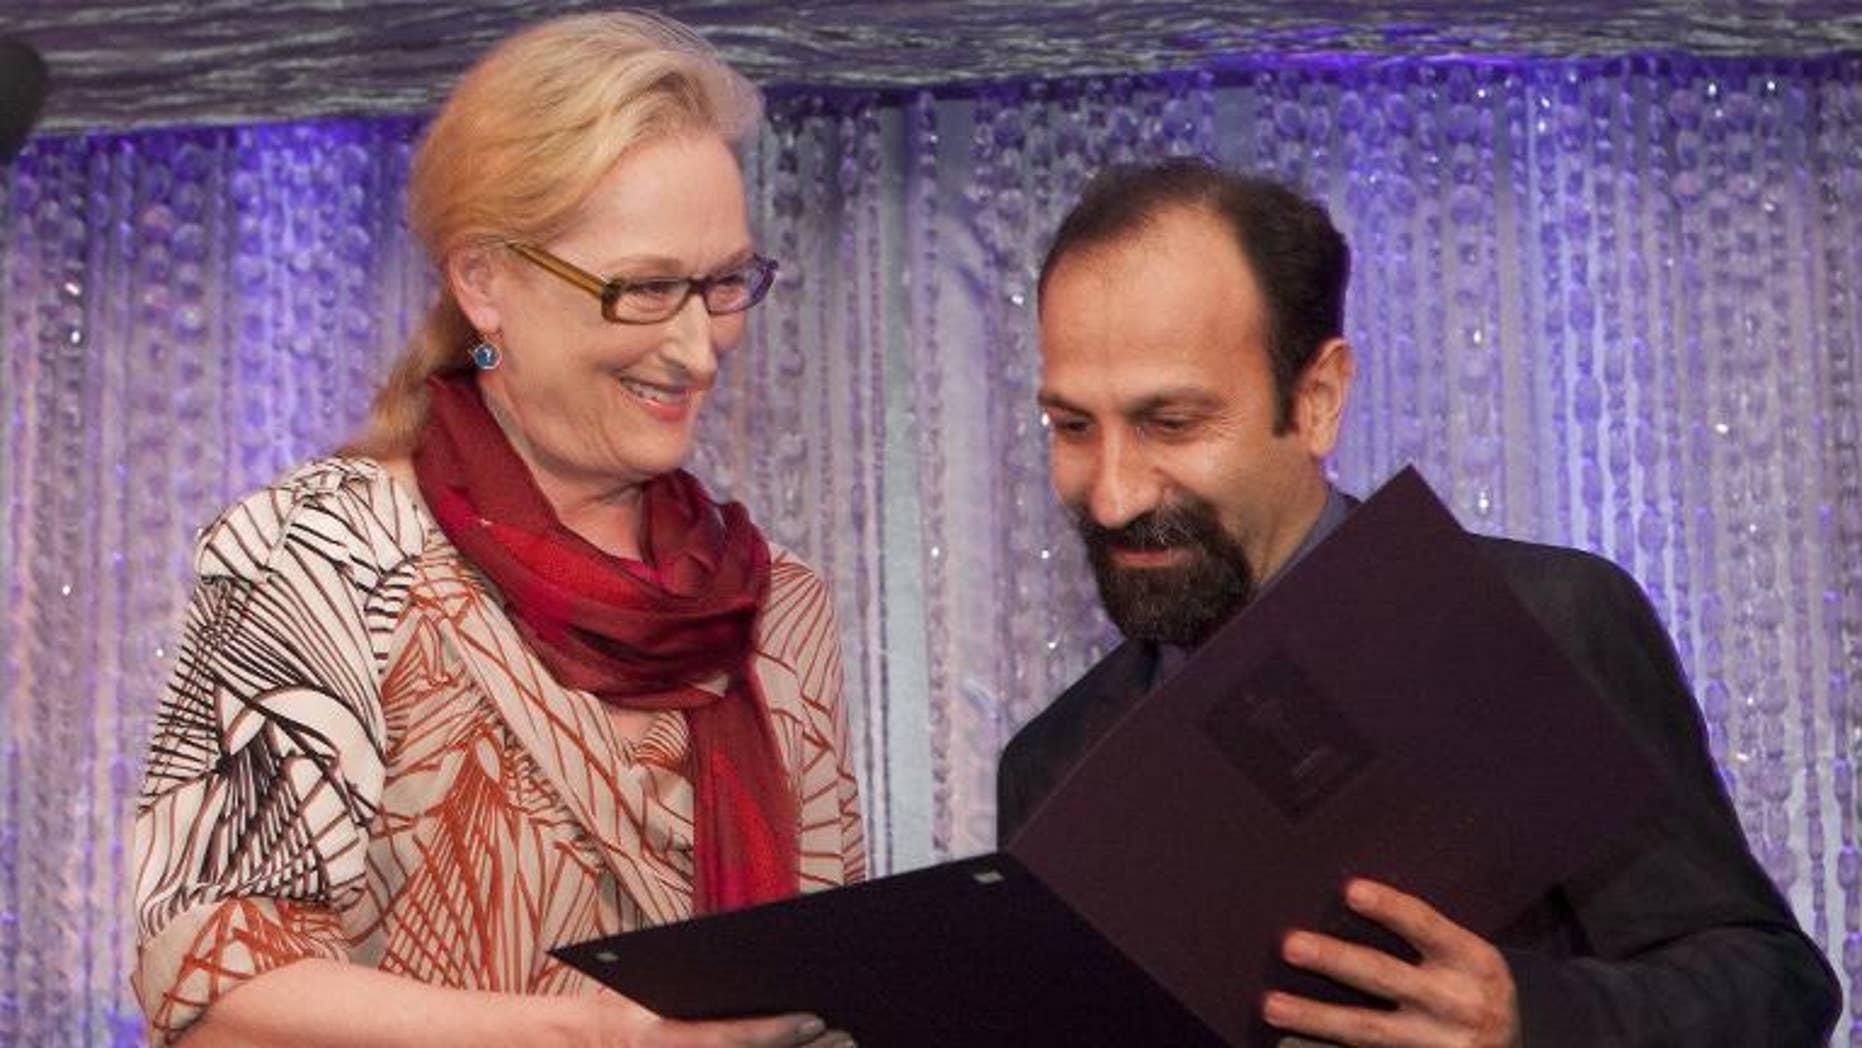 Actress Meryl Streep and Iranian director Ashgar Farhadi on February 24, 2012 in Beverly Hills, California